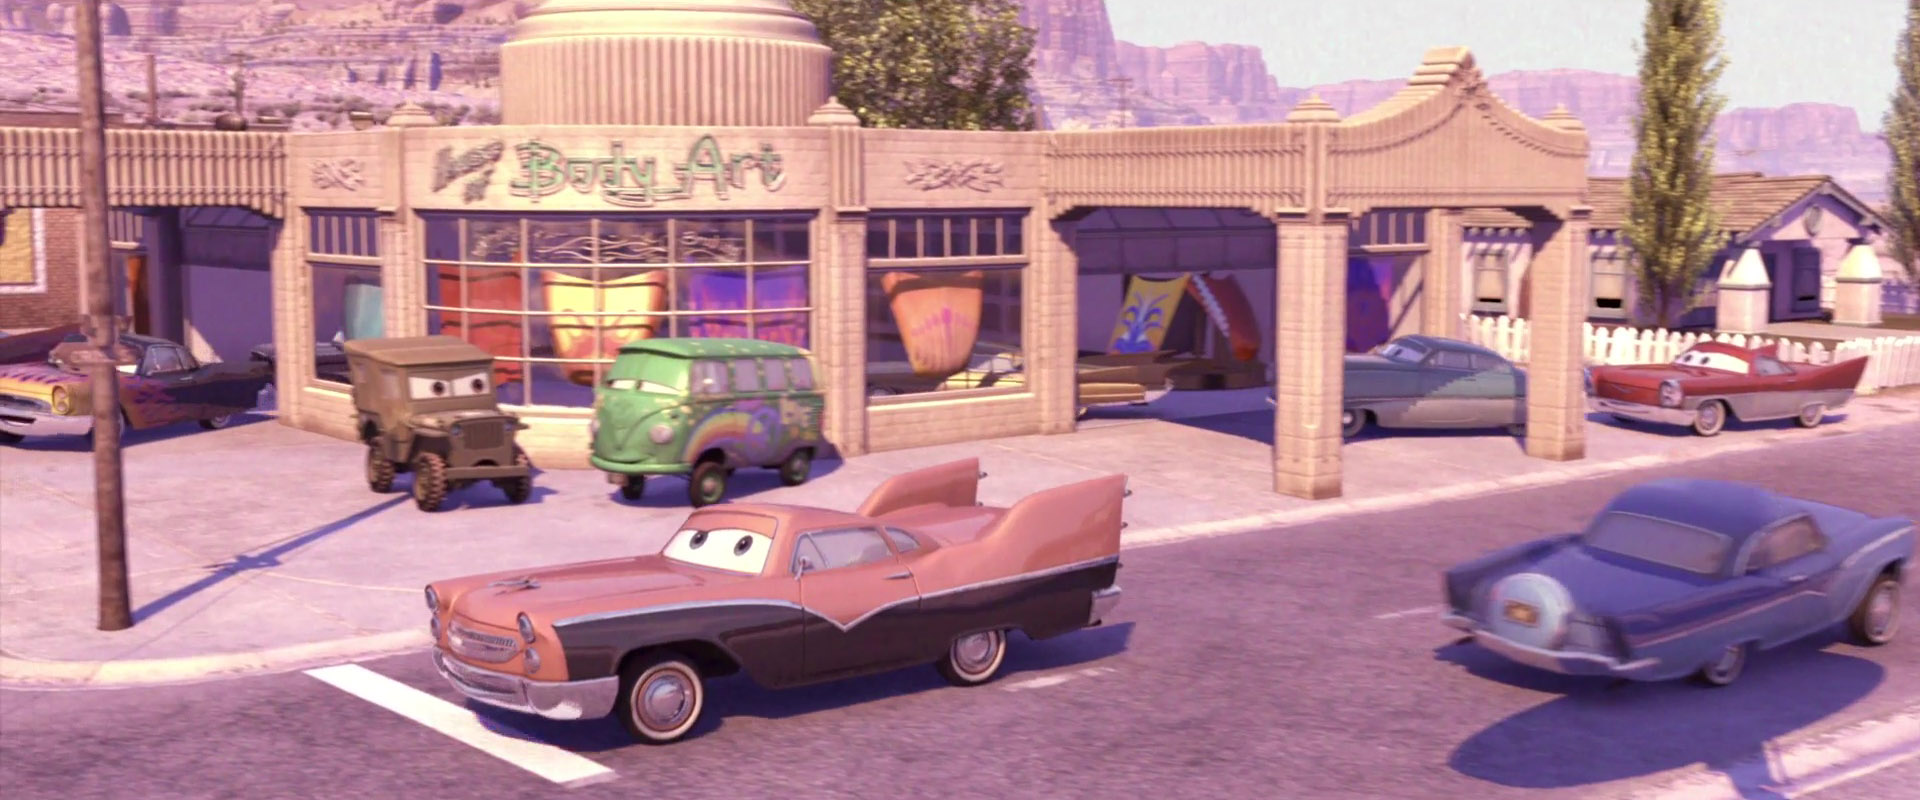 hank-halloween-murphy-personnage-cars-01